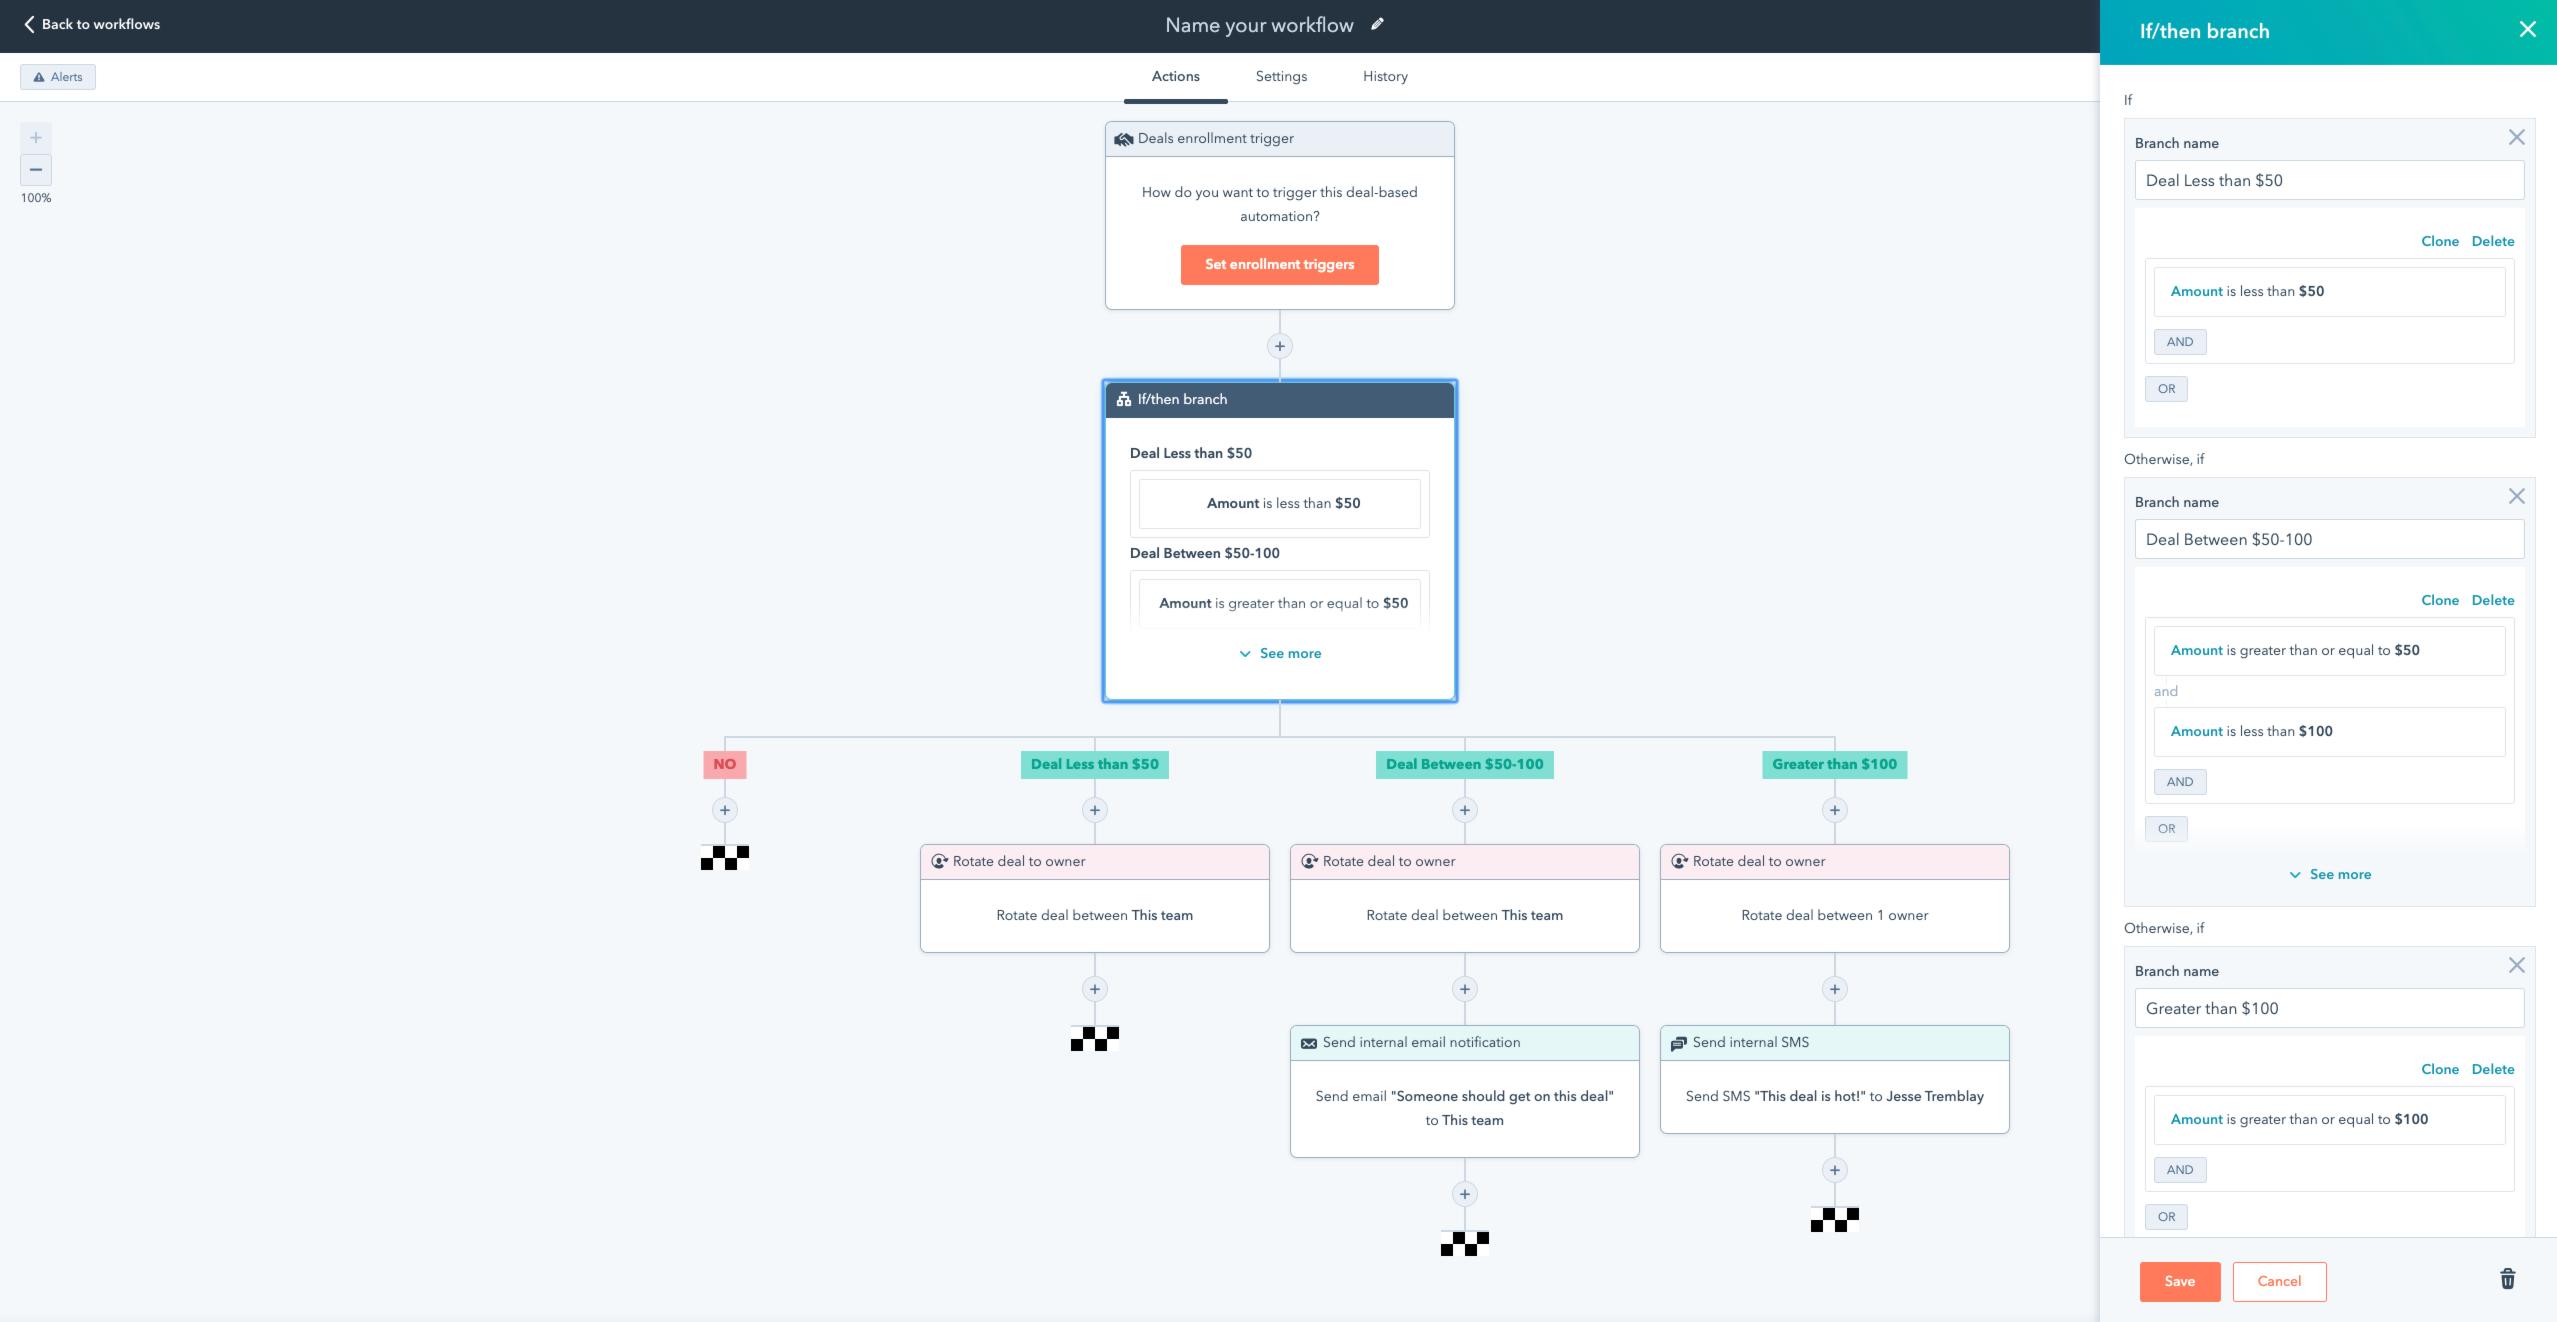 Workflow Branch